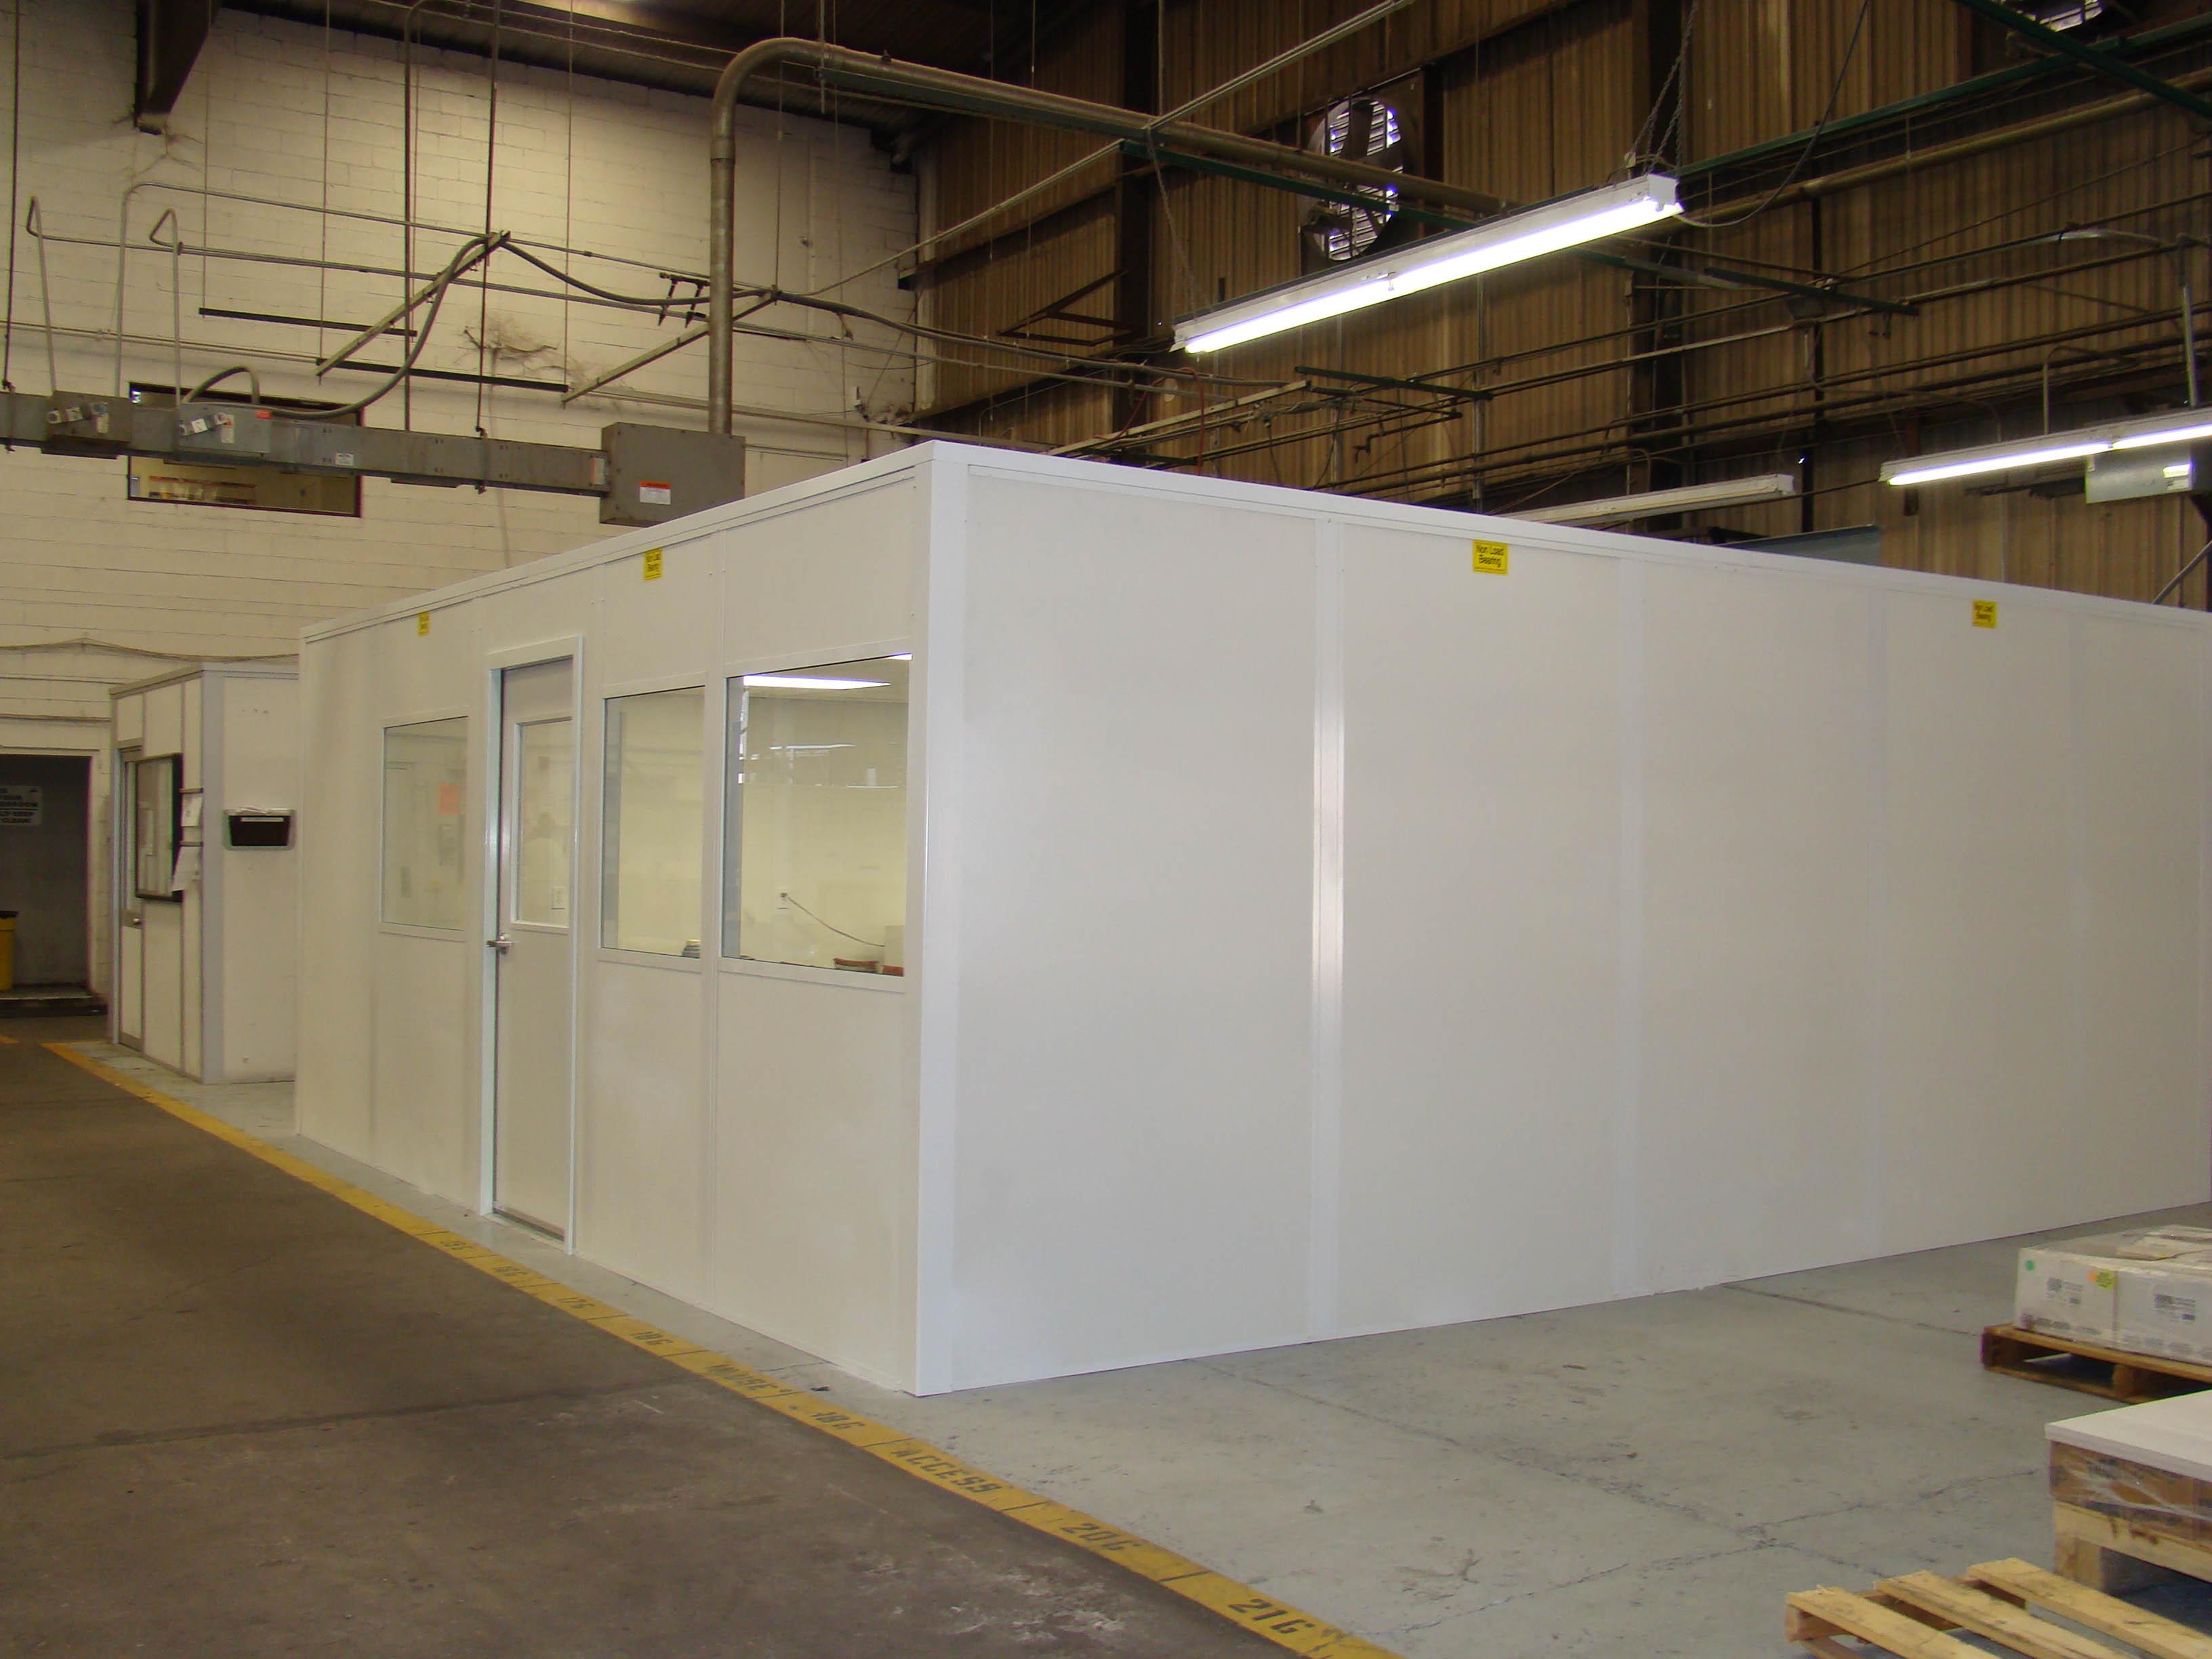 Quick guide modular breakrooms panel built inc for Prefab room